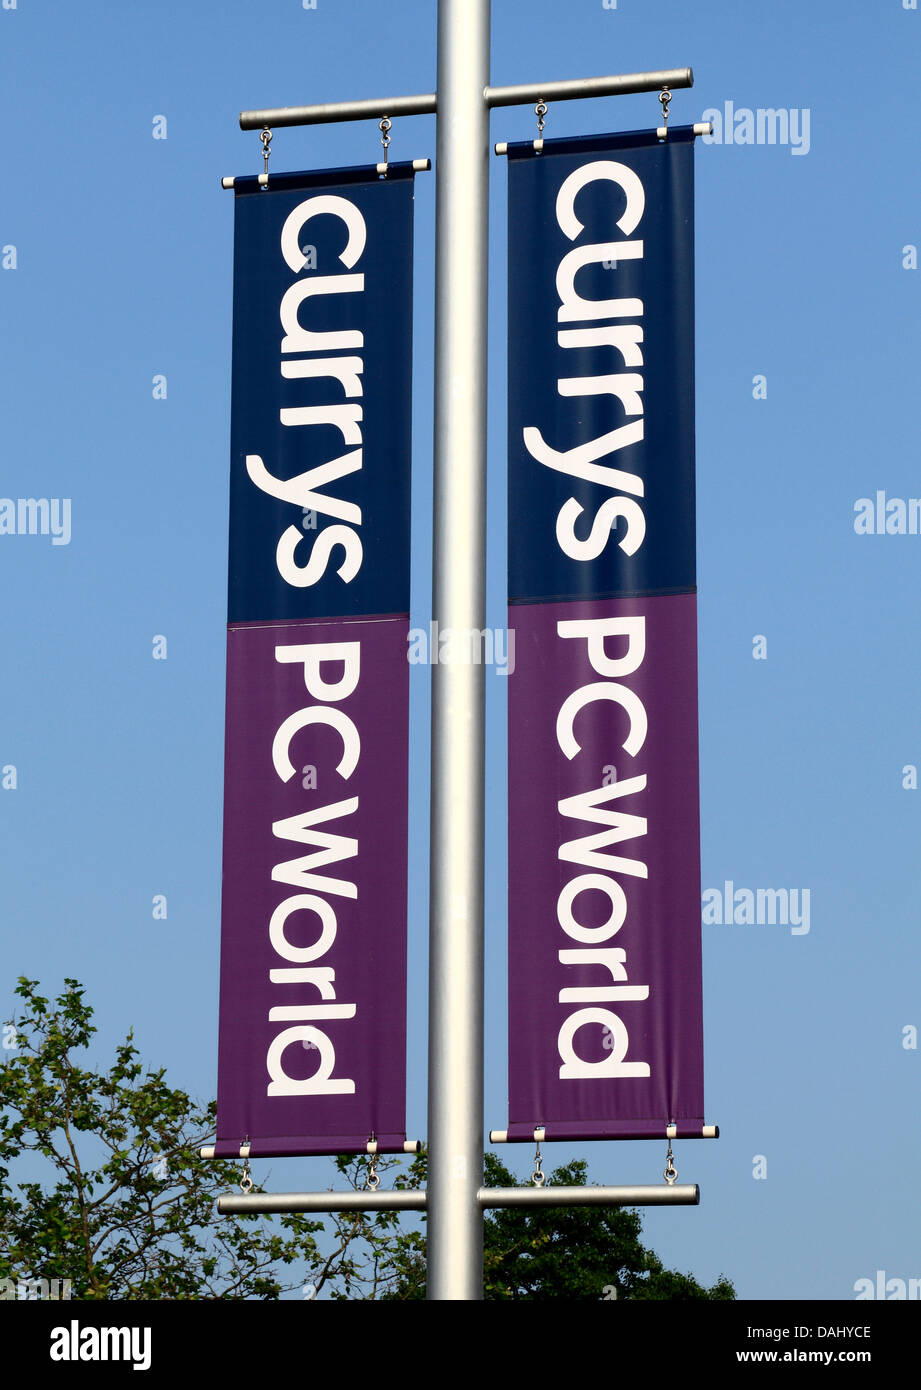 PC World, currys, signo de banner, logo, PCWorld England Reino Unido. Imagen De Stock